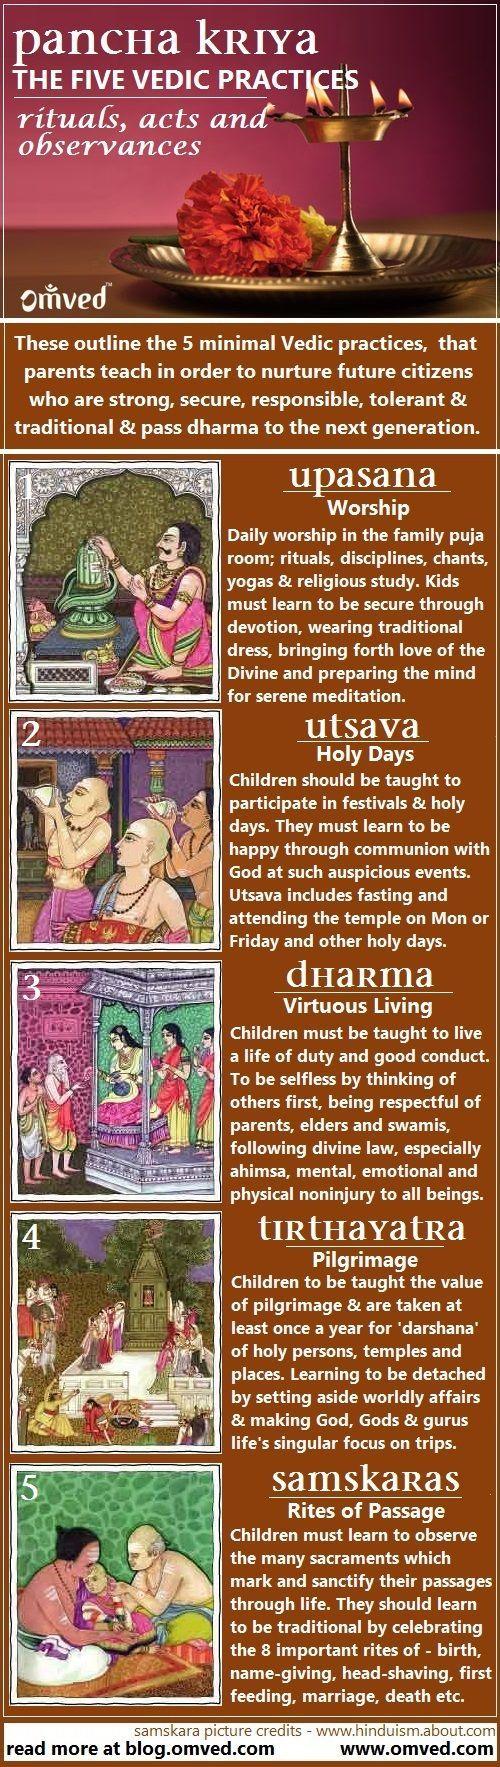 The Five Vedic Practices